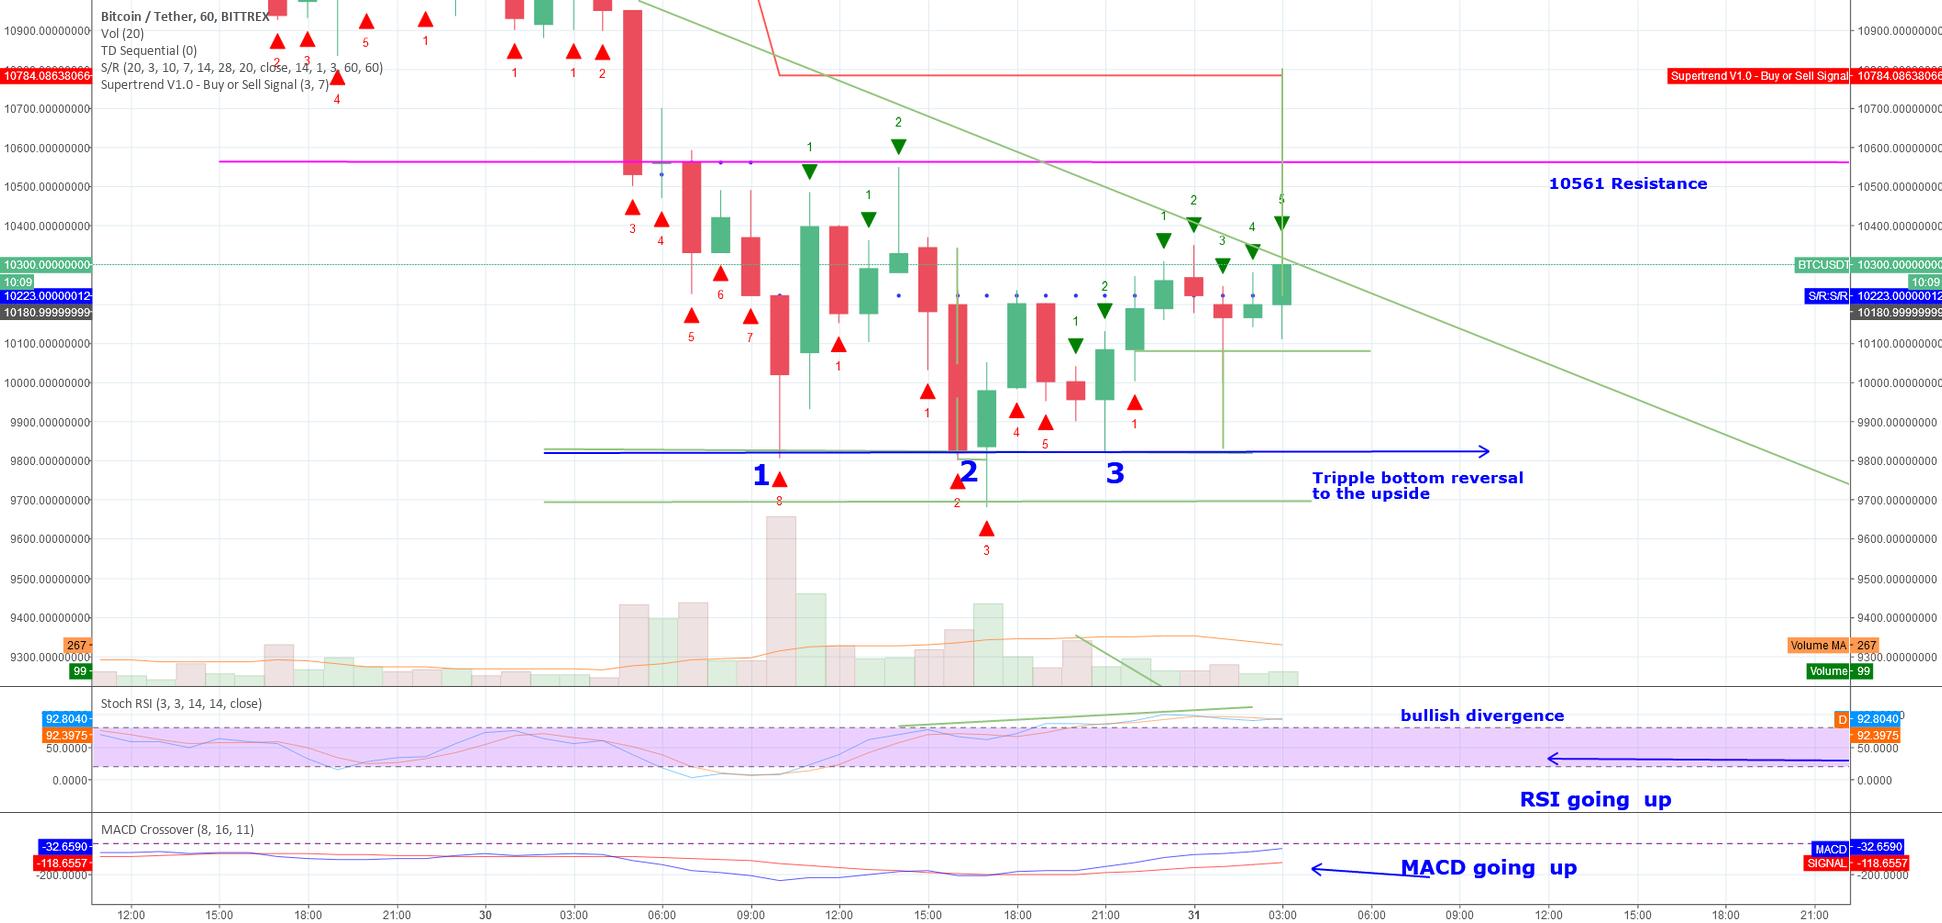 Tripple bttom reversal +  bullish divergence  =  moving upwards